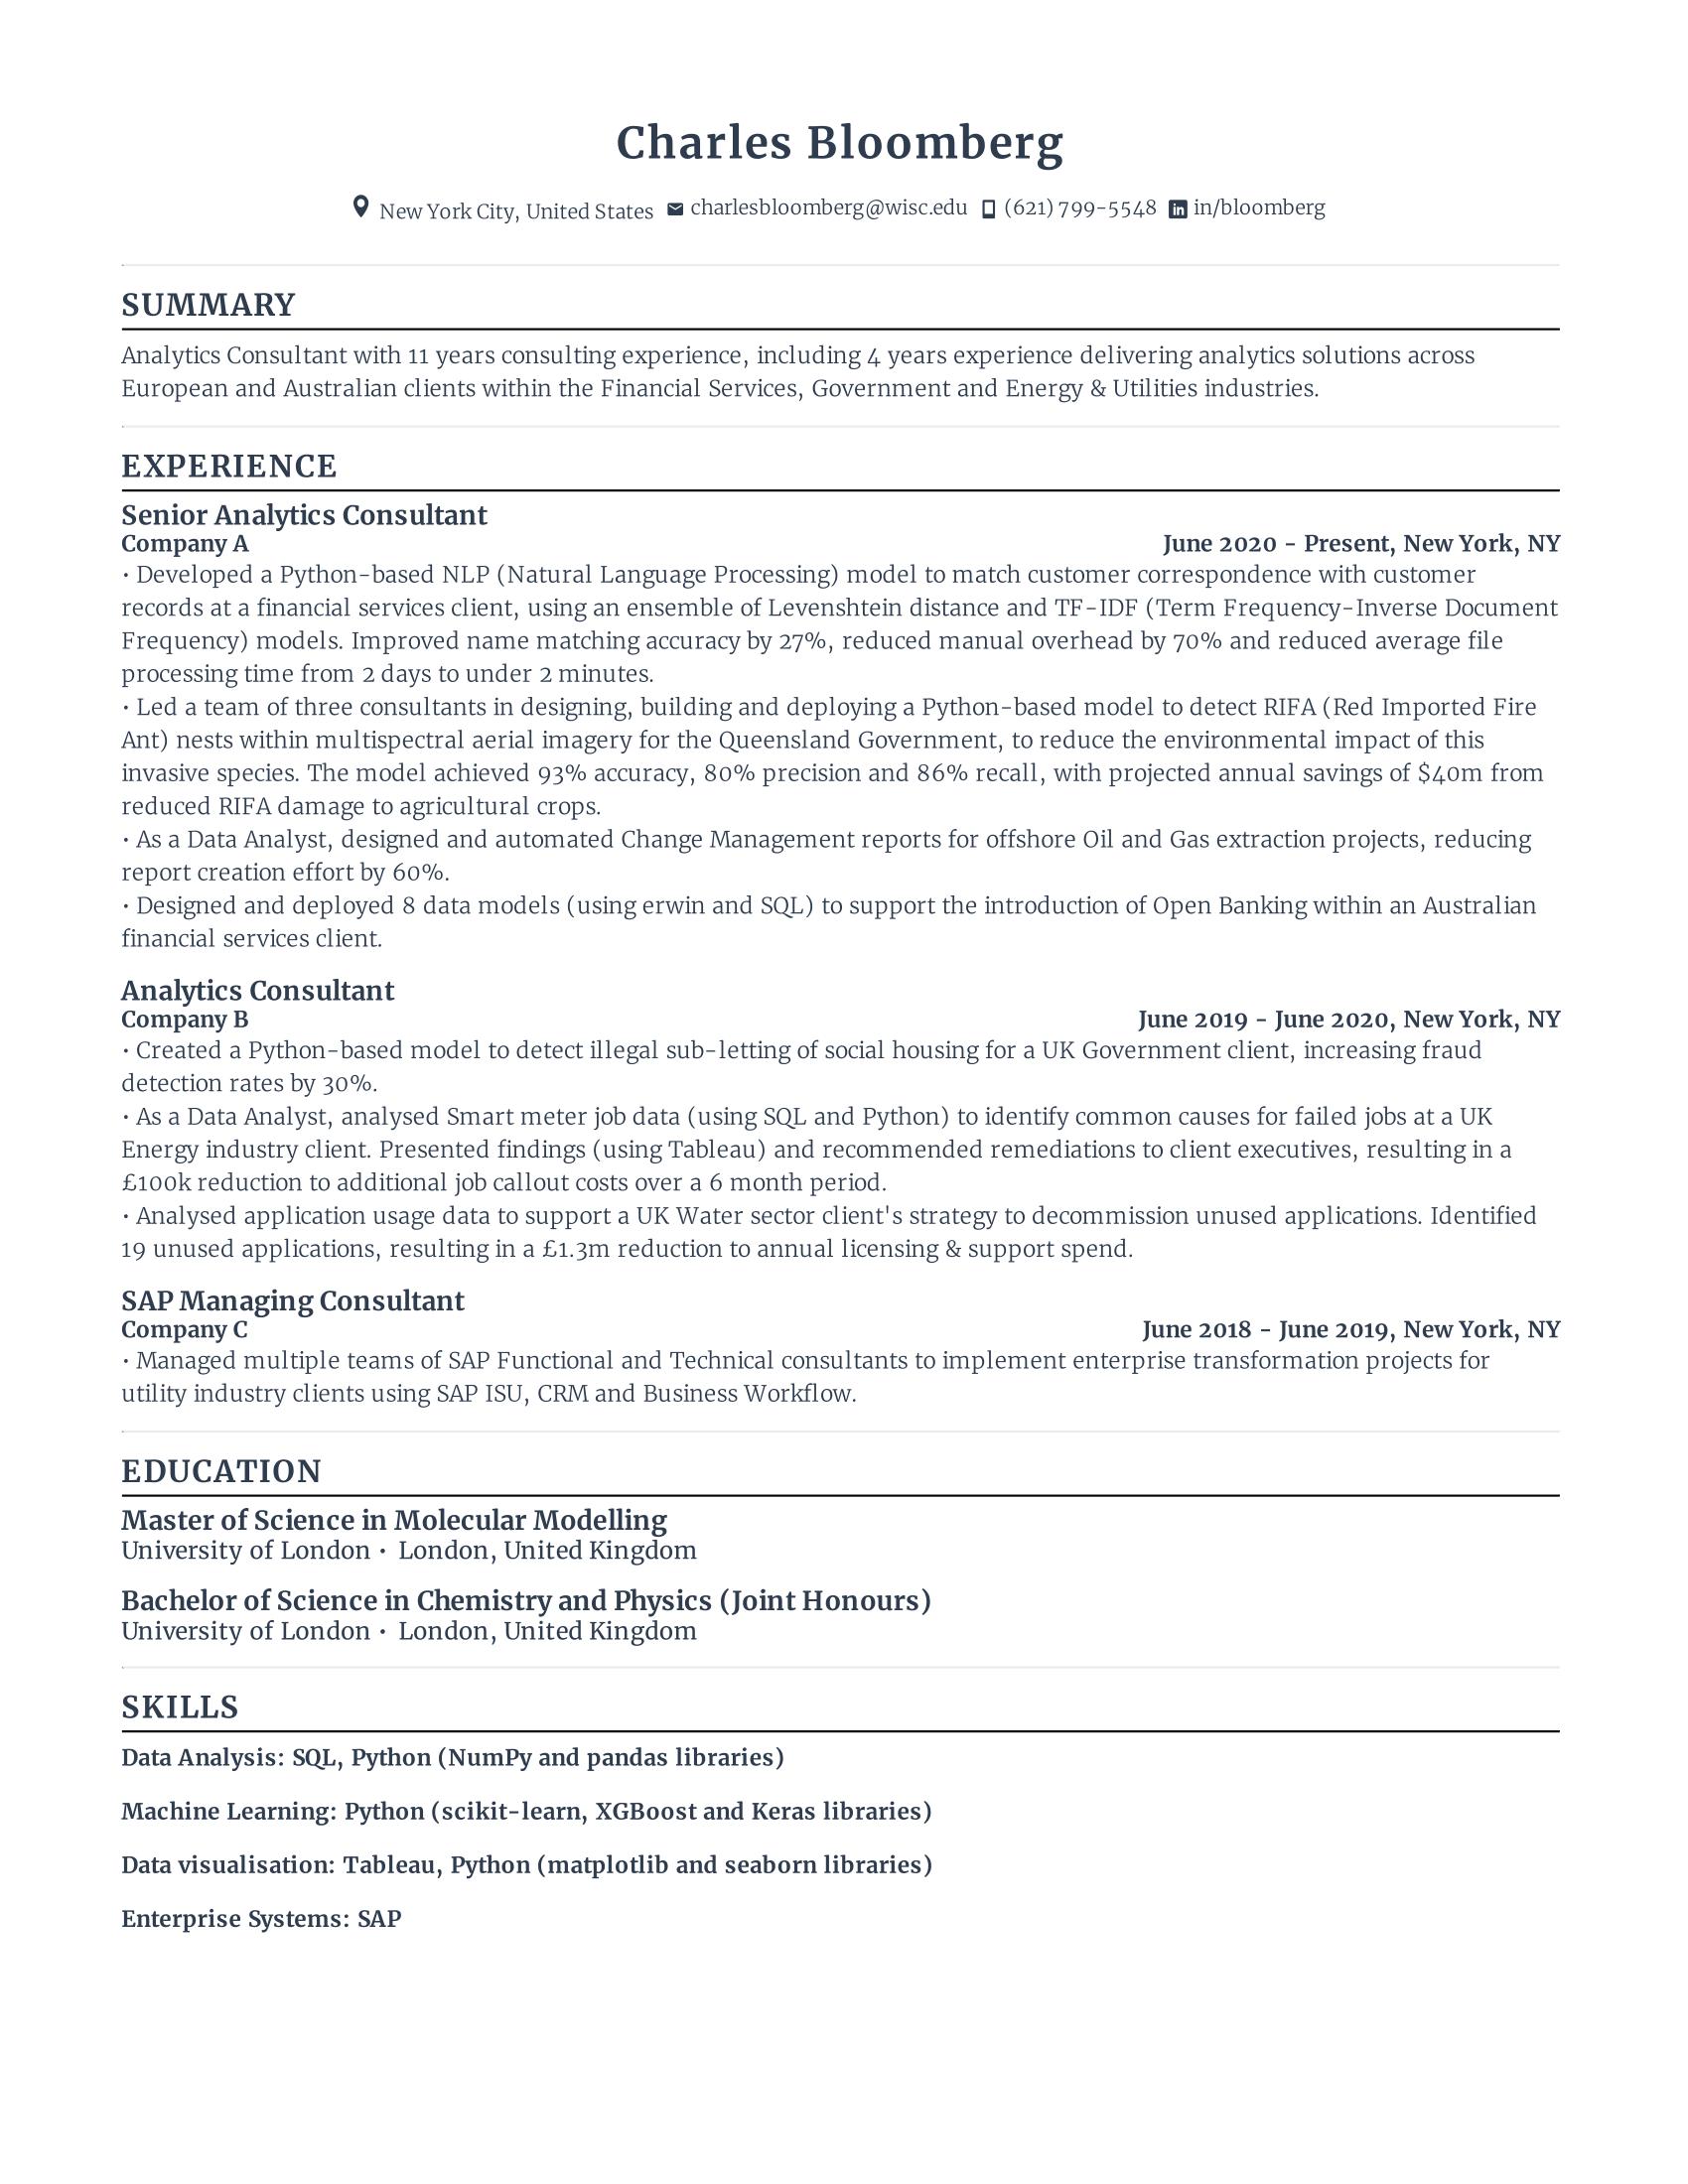 Senior Data Analyst